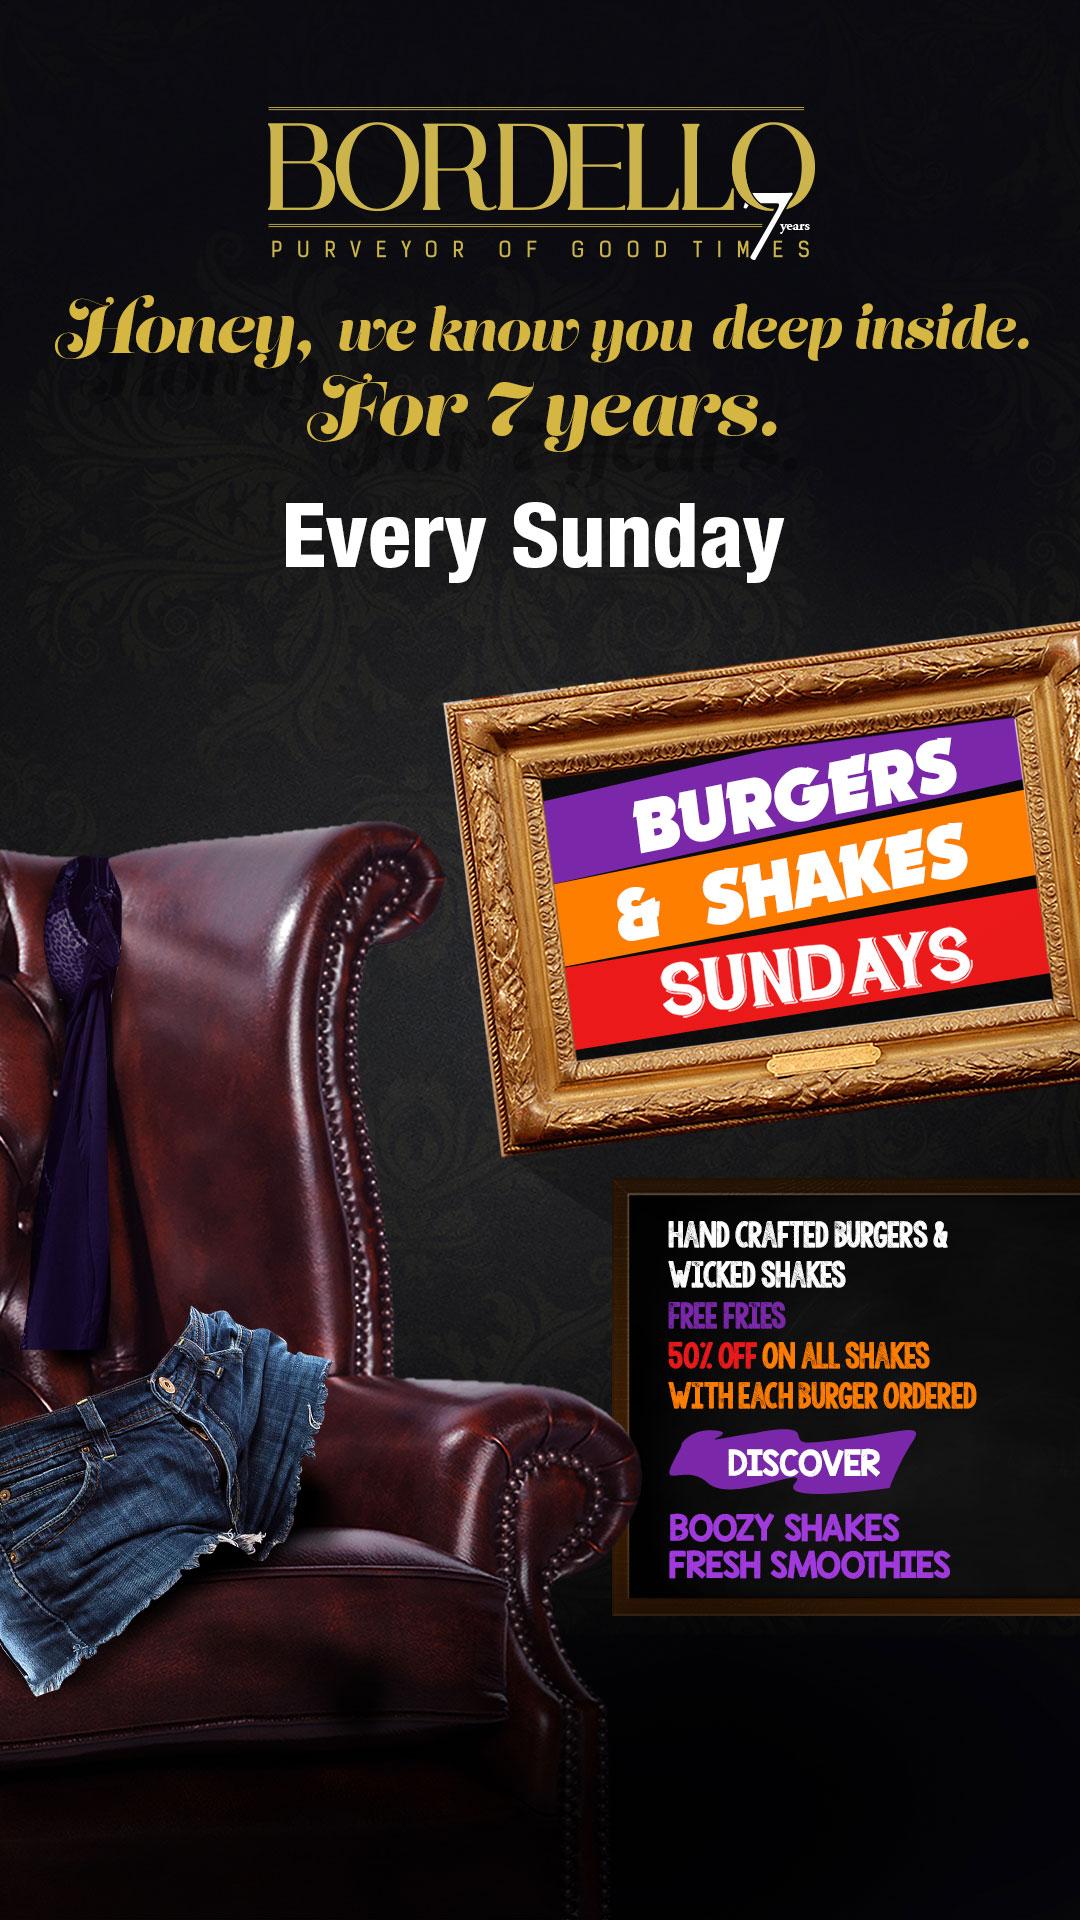 Burgers & Shakes Sundays